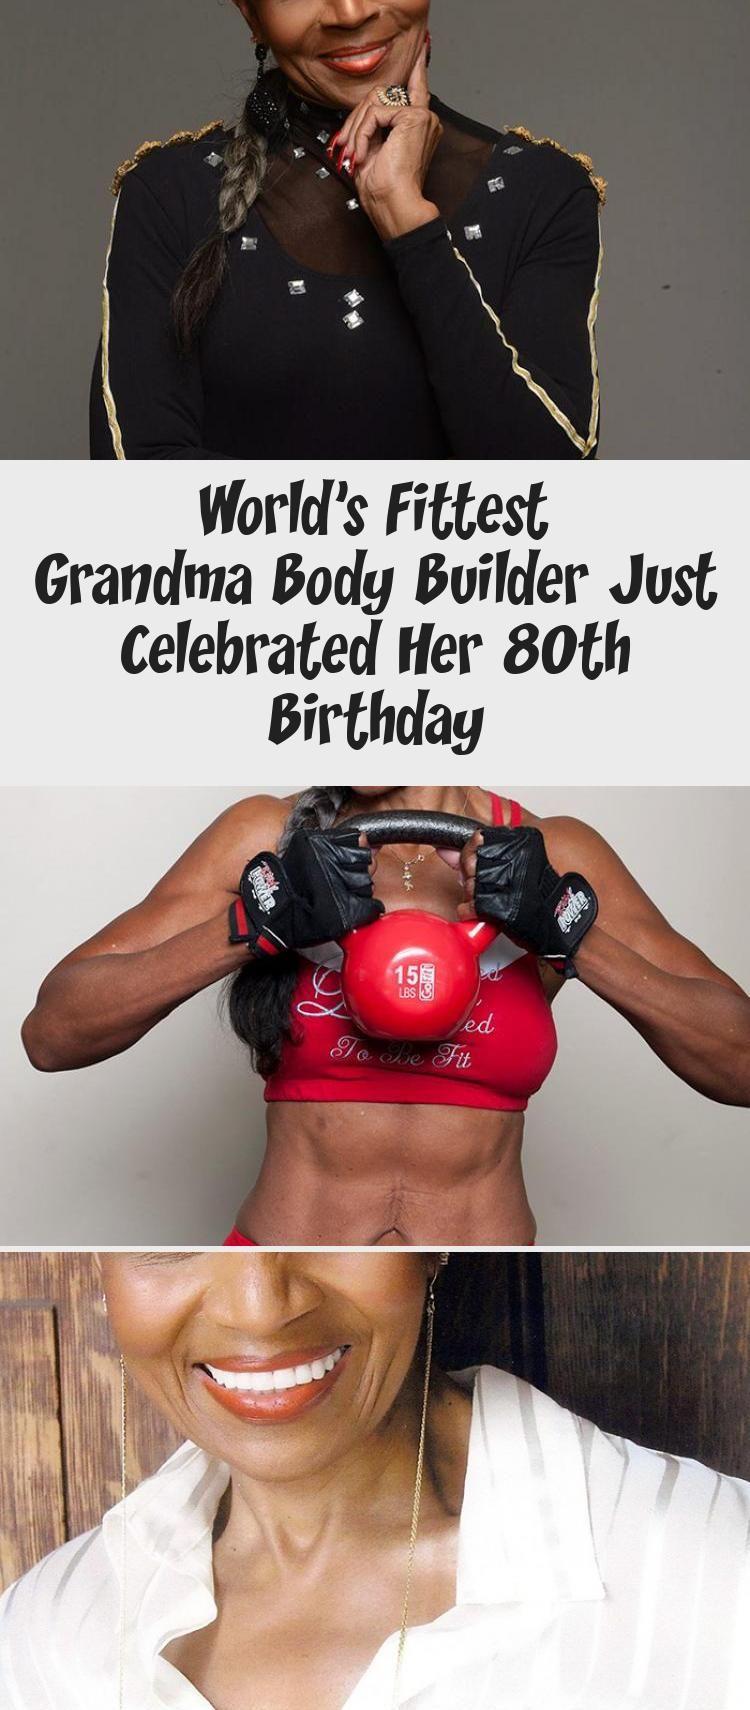 Australias fittest grandma: The 75yo bodybuilders